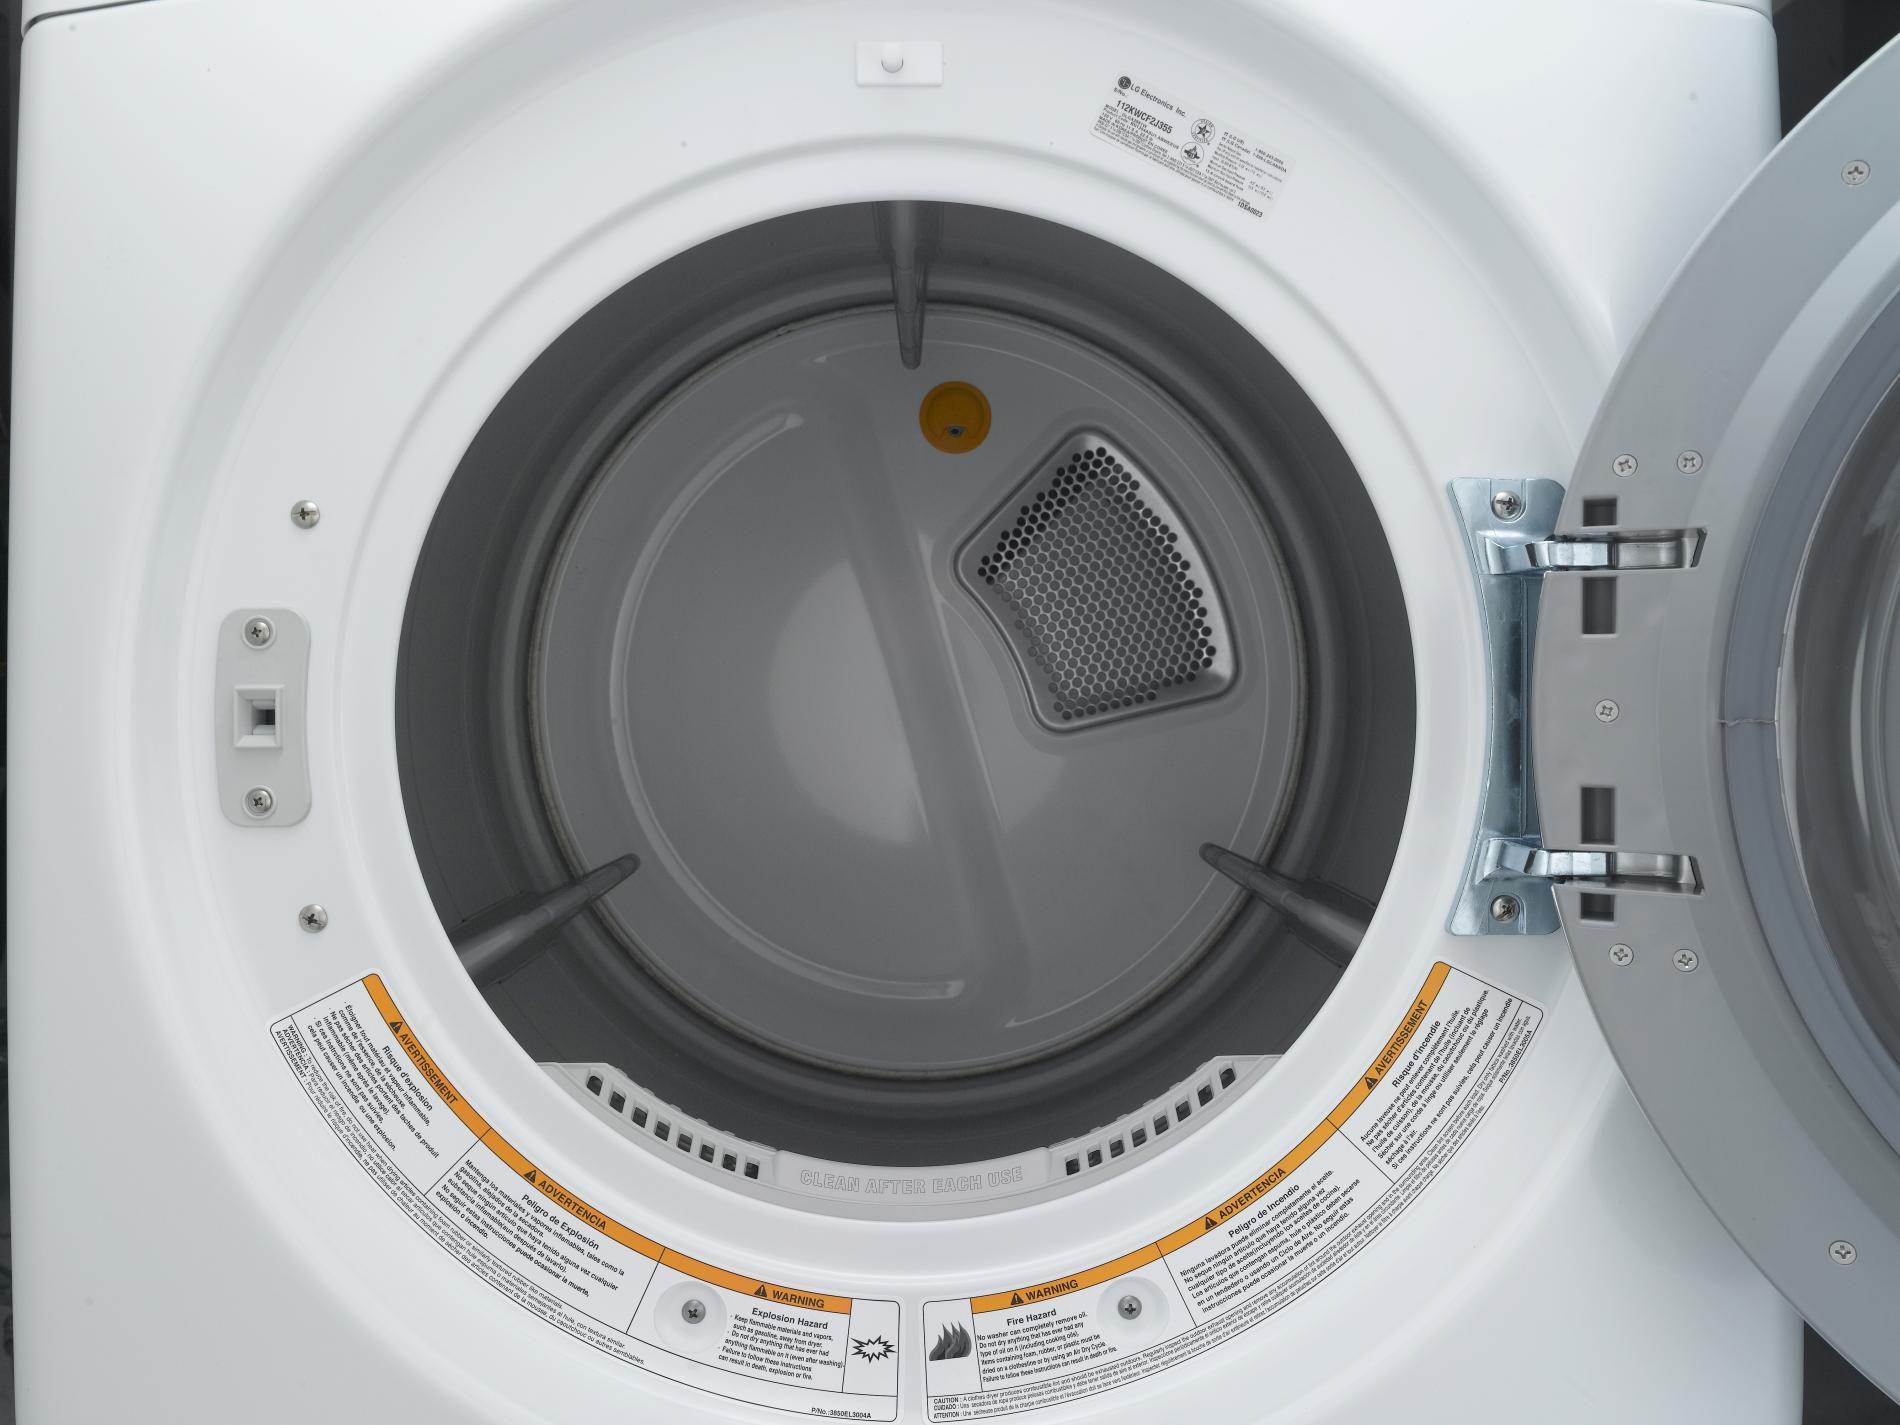 LG 7.3 cu. ft. Electric Dryer w/Steam - White